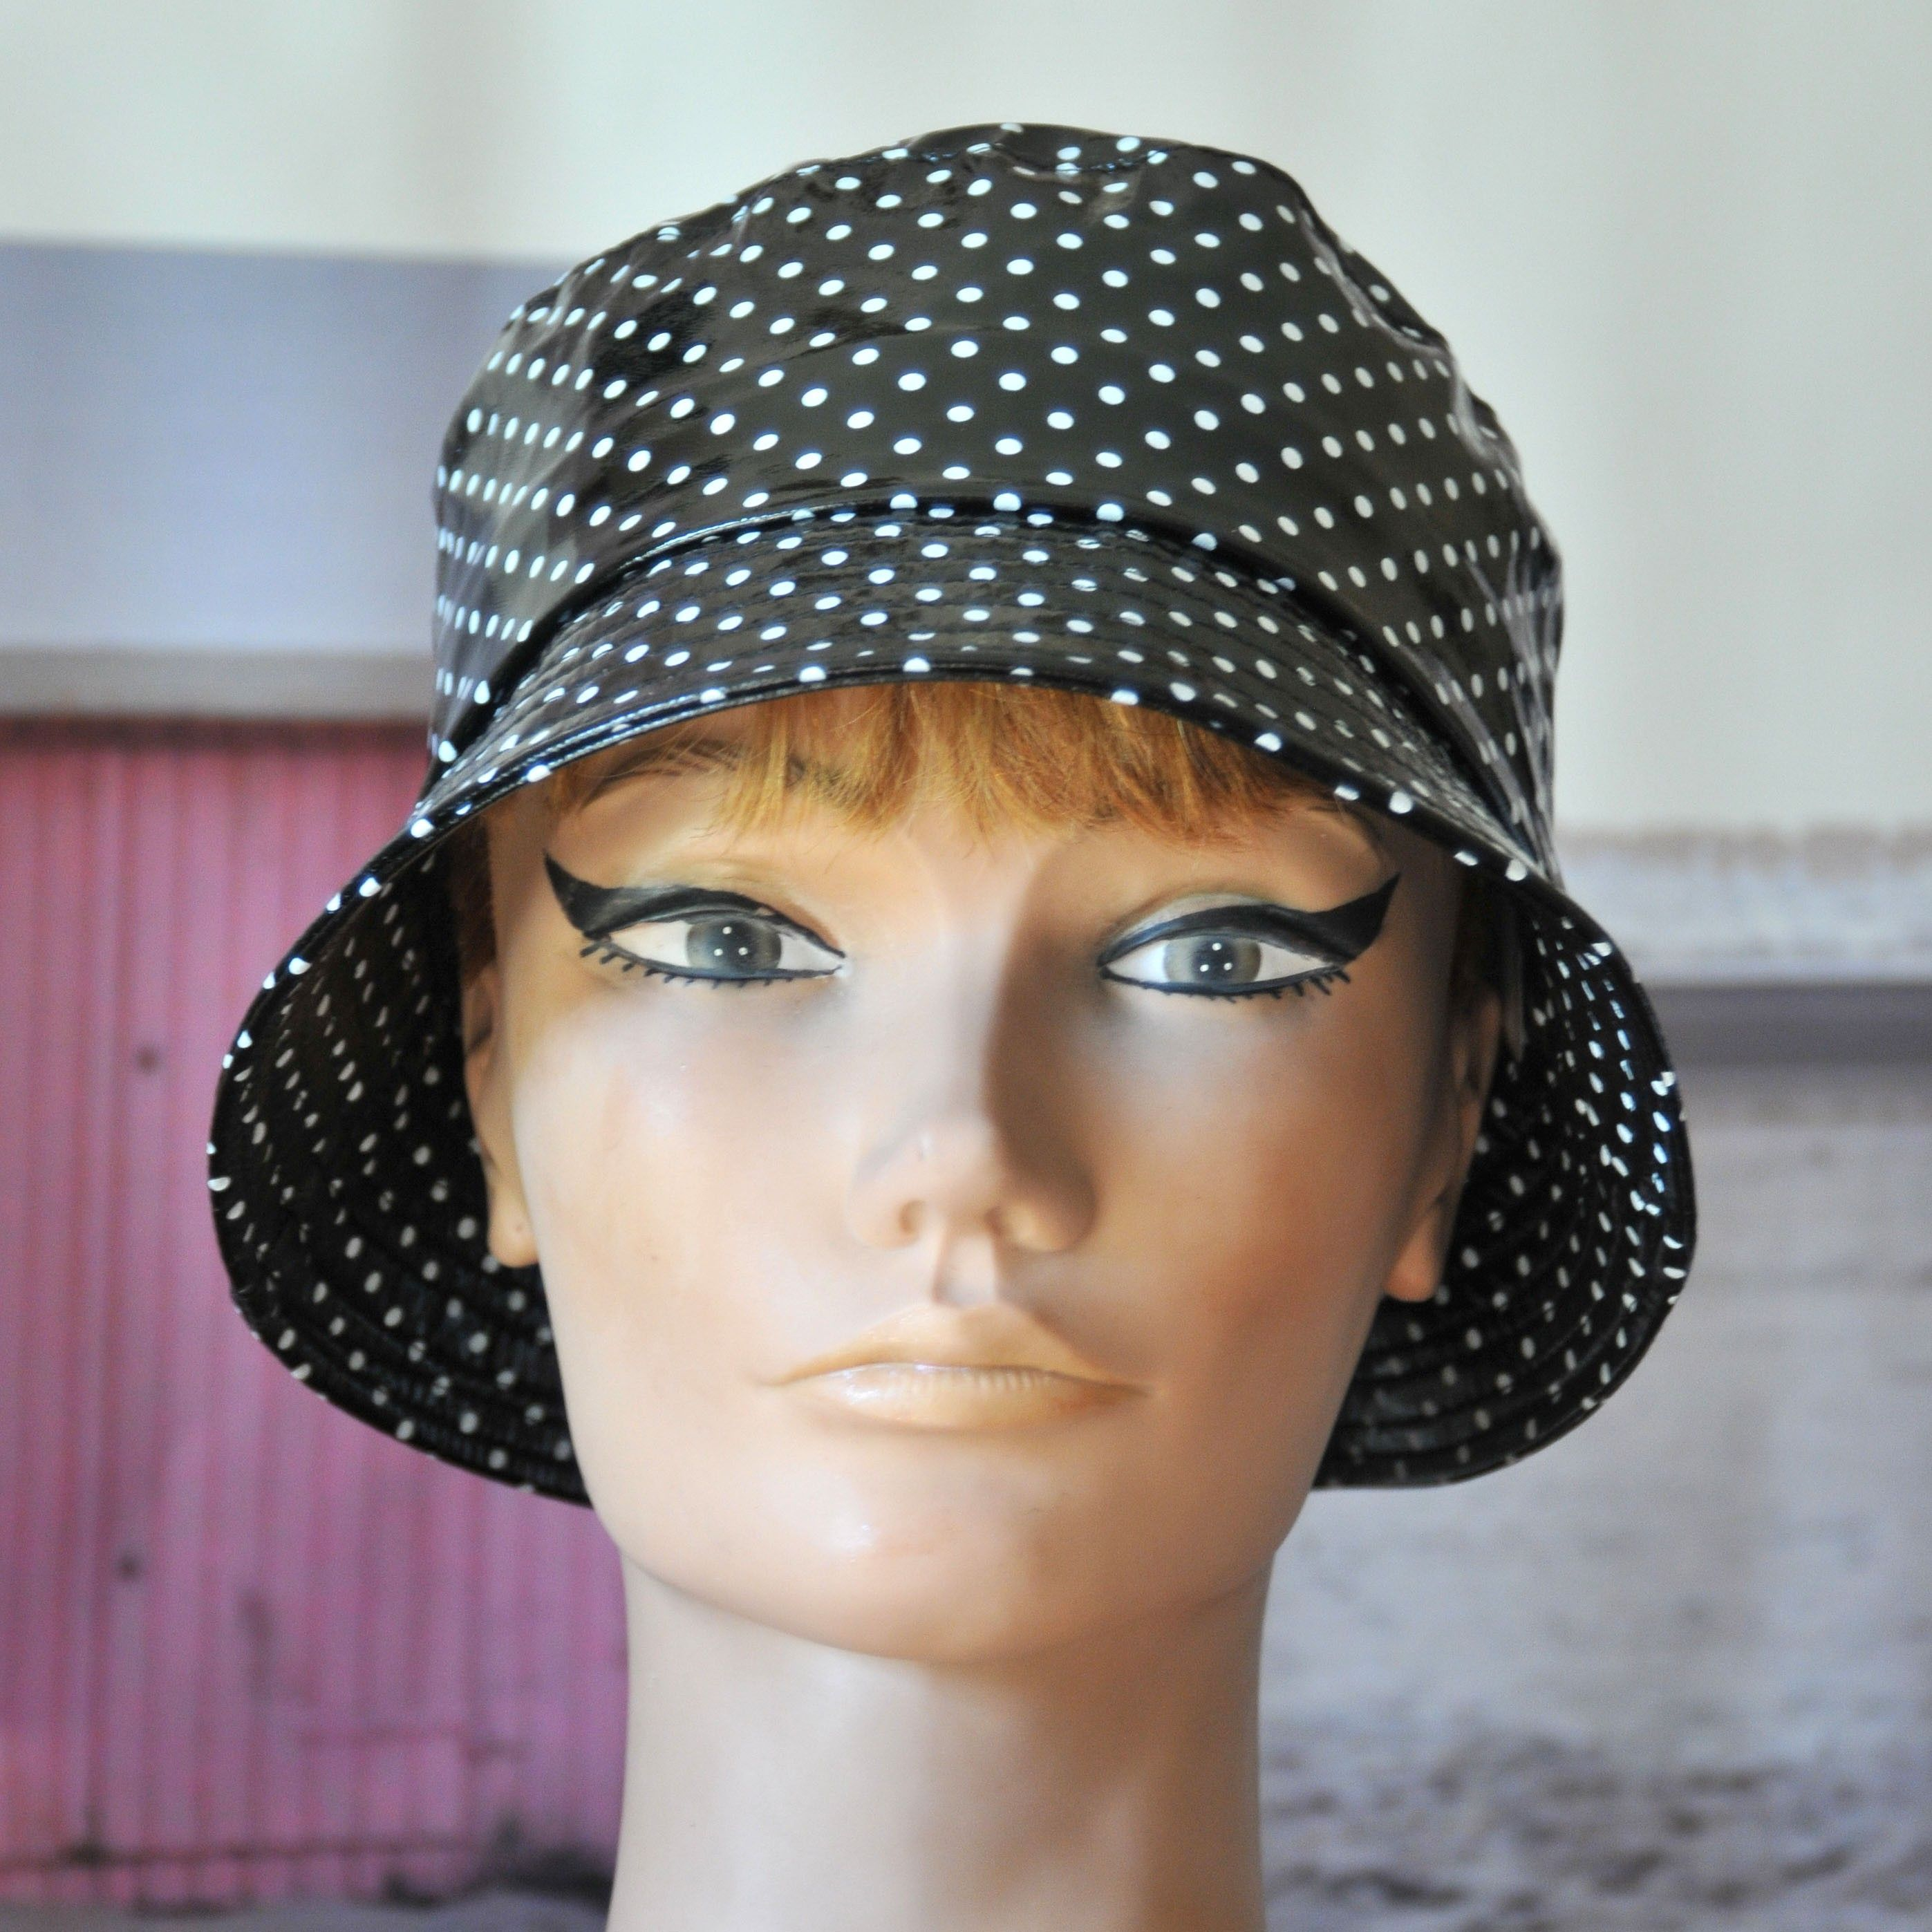 Sombrero de lluvia mujer impermeable aspecto encerado d675a8fa875